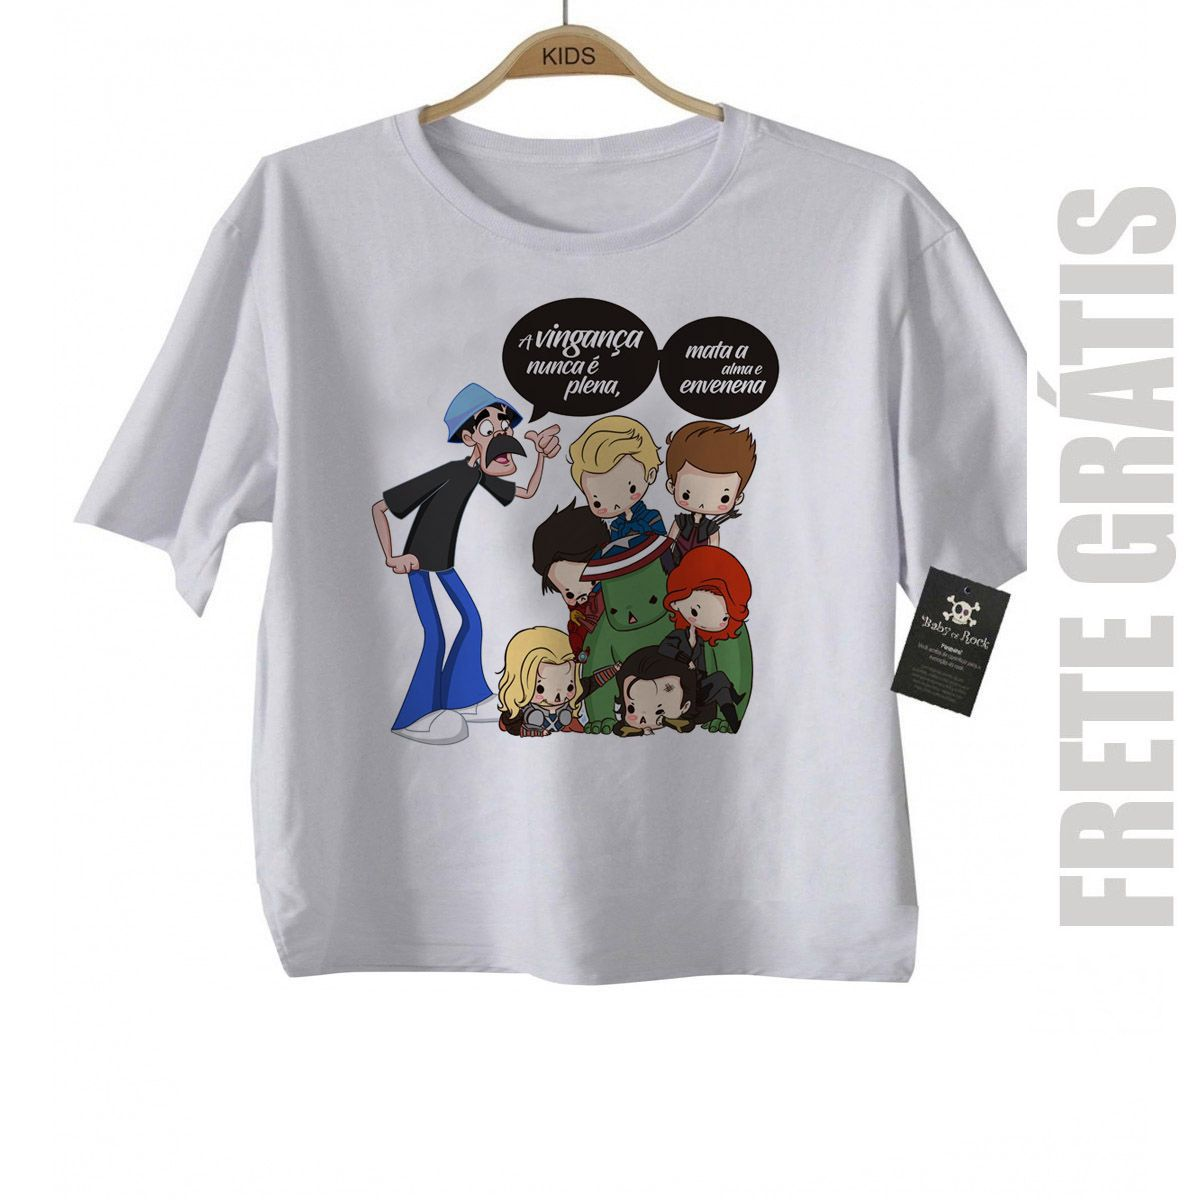 - Camiseta infantil   Nerd / Geek  Seu Madruga e os Vingadores - White  - Baby Monster S/A